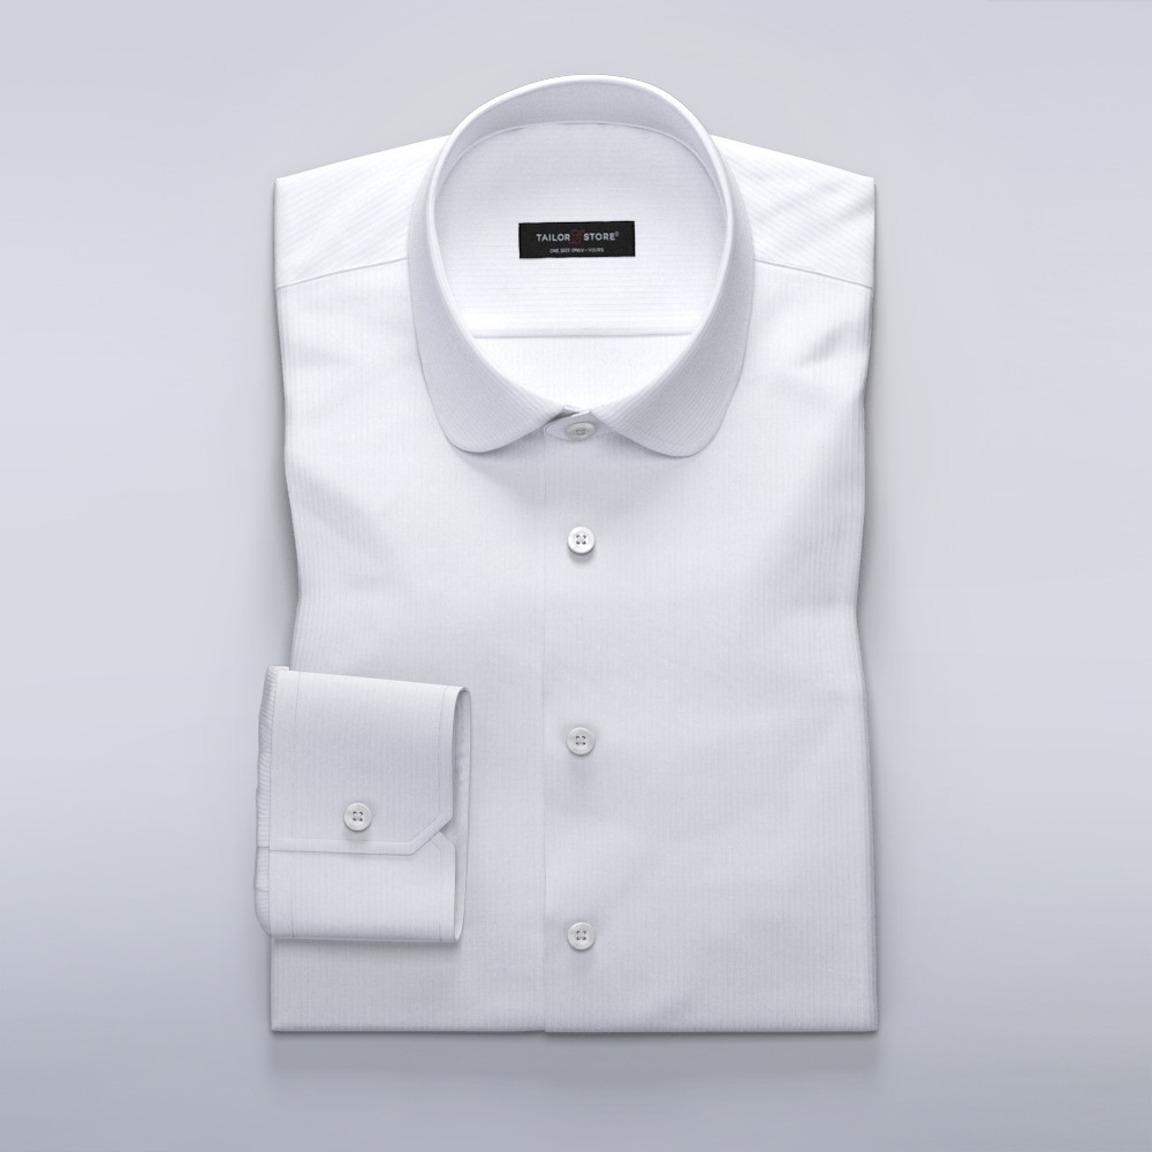 Chemise blanche business pour femmes en herringbone